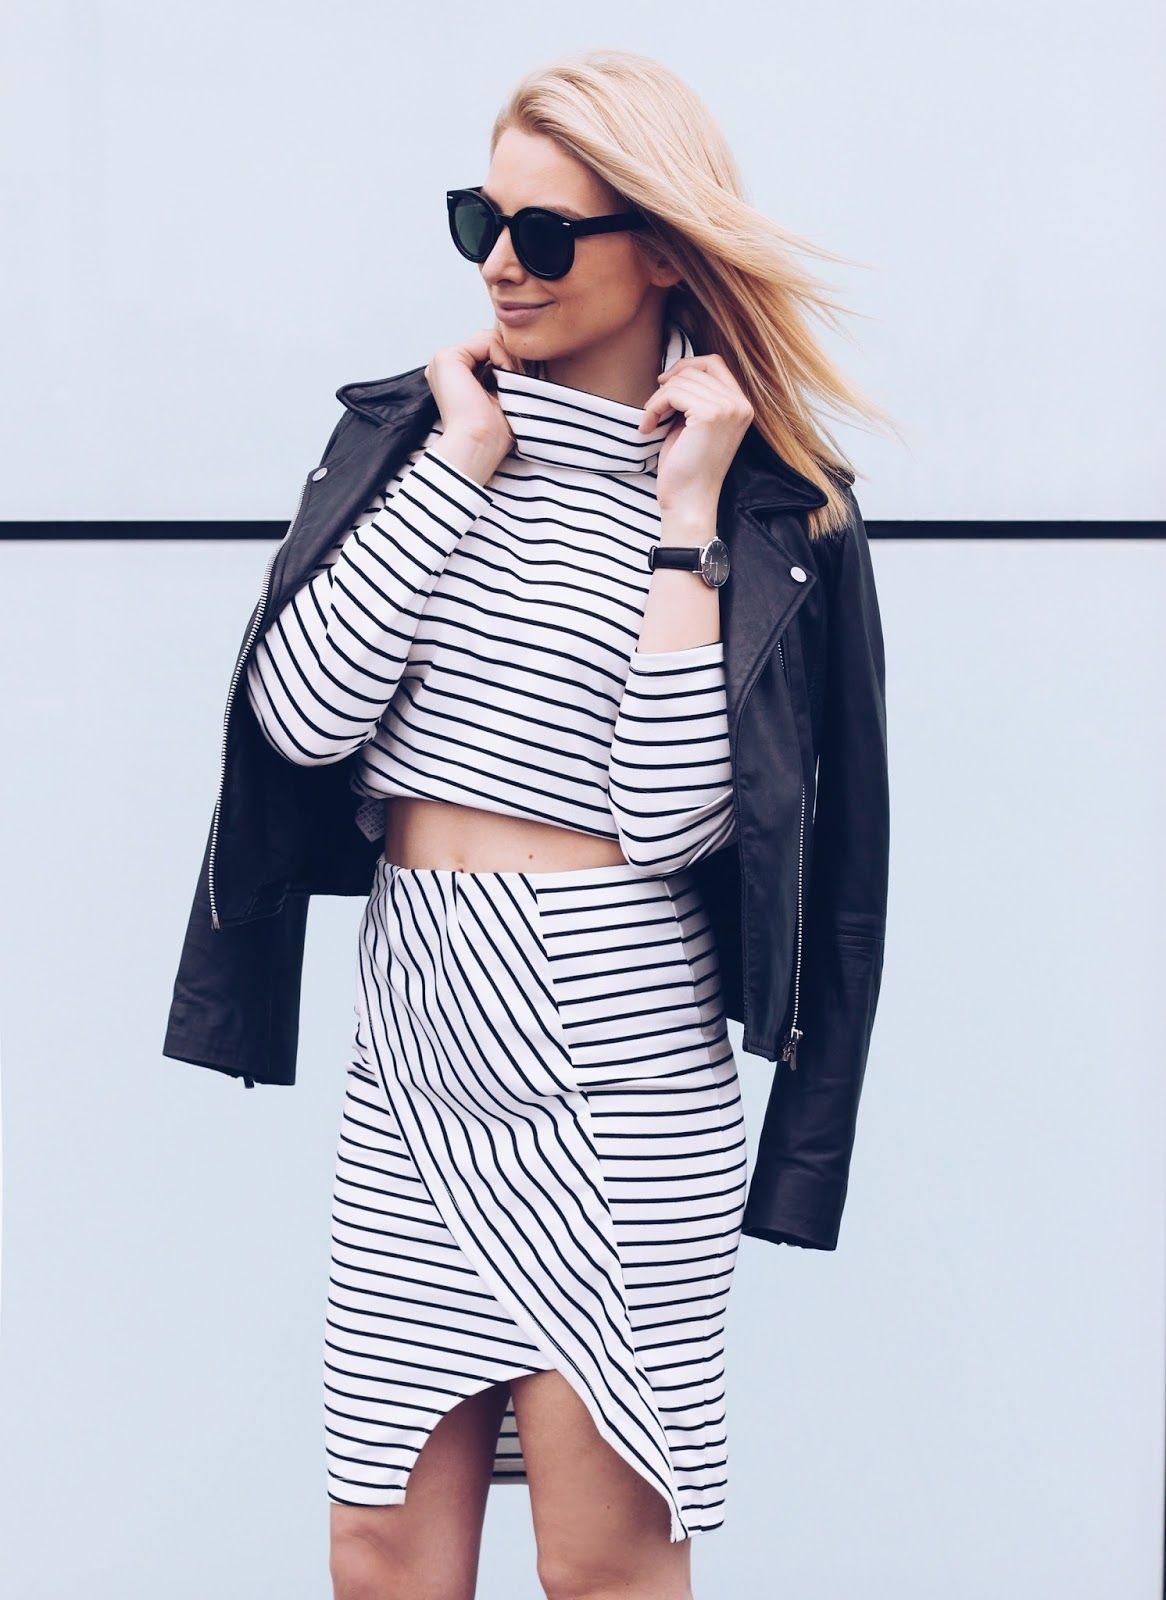 8595ce33996 Womens Designer Round Oversize Retro Fashion Sunglasses 8623 ...